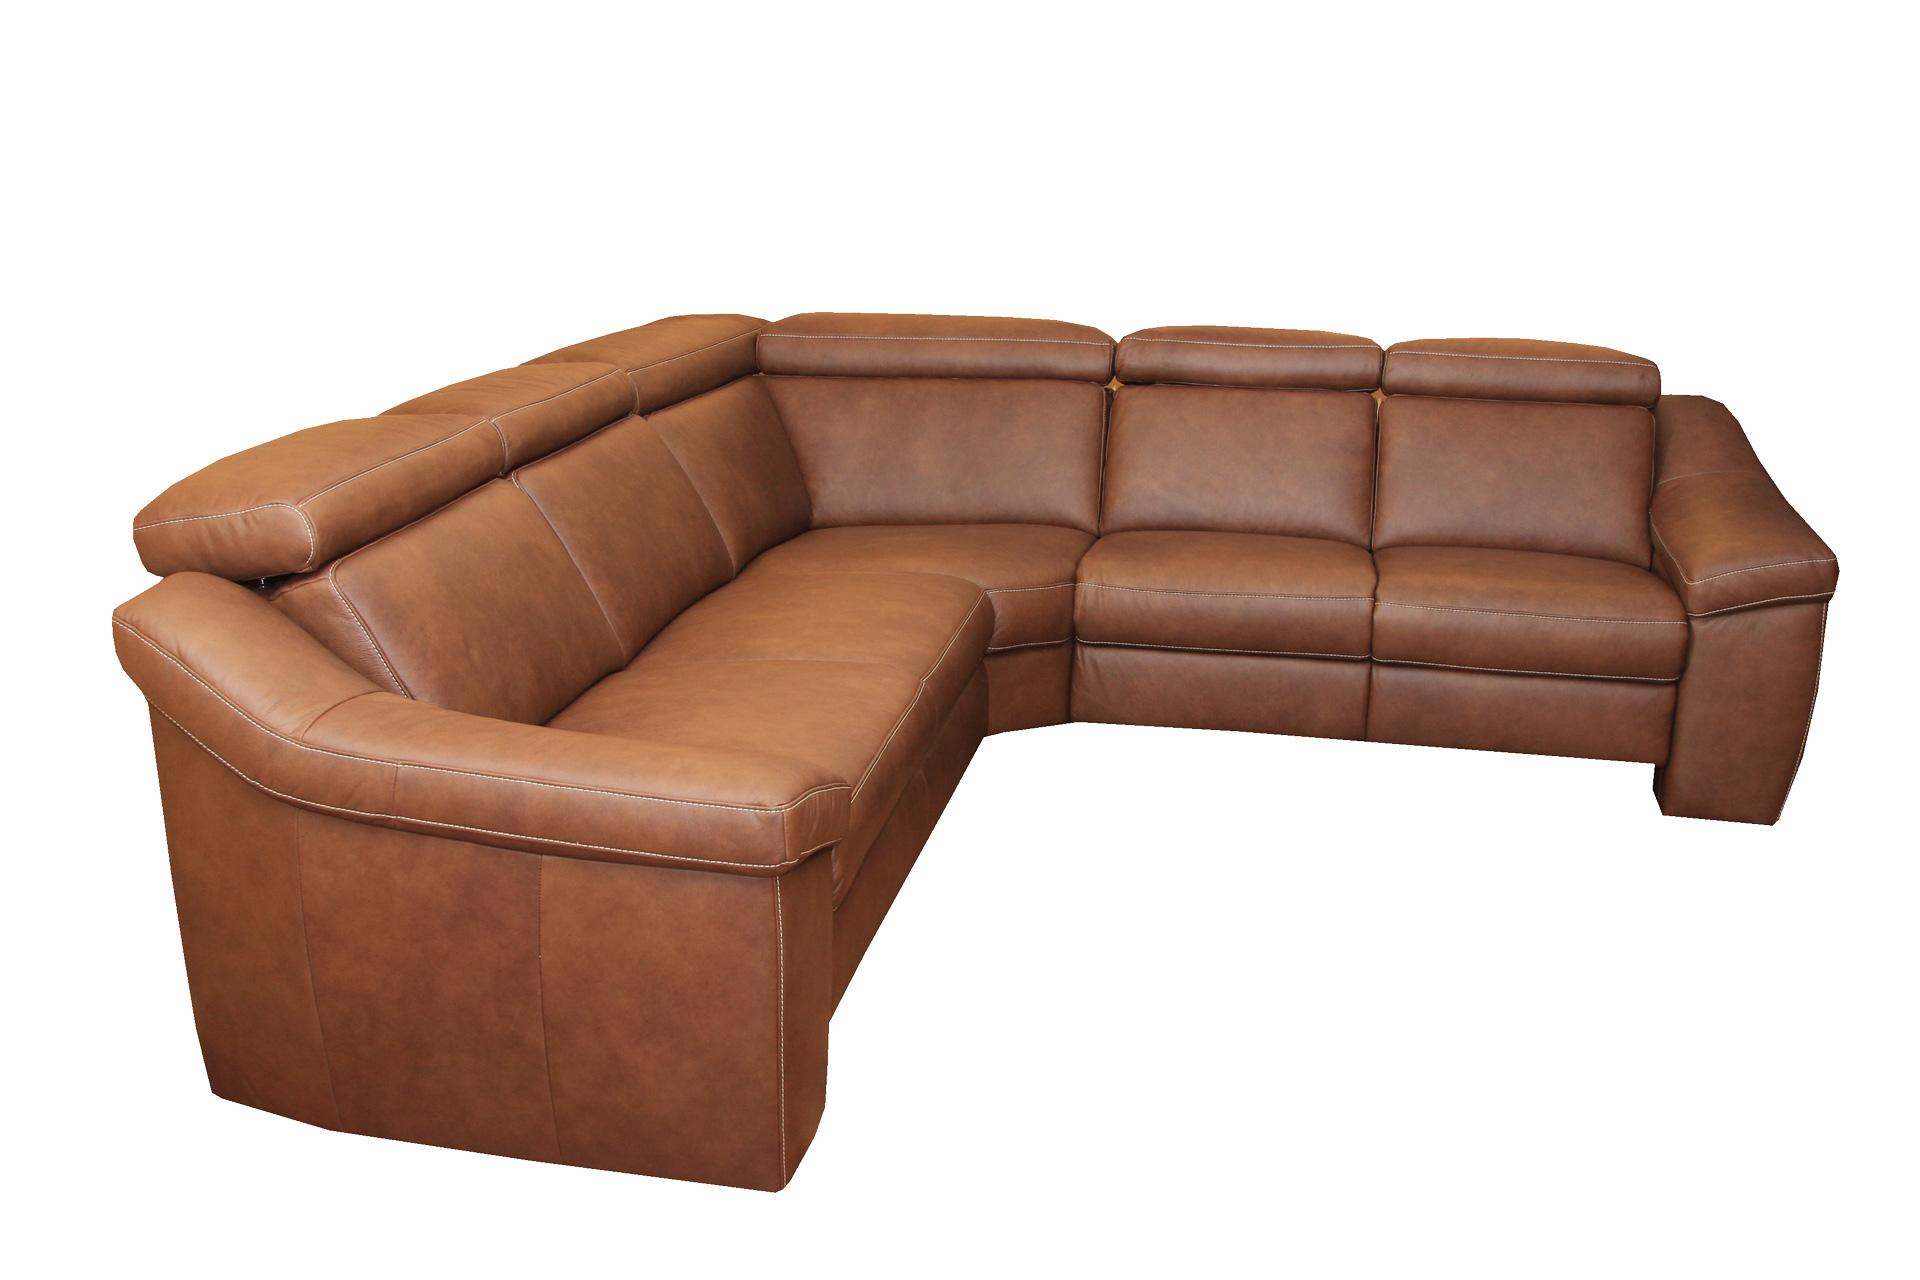 Luxury bőr ülőgarnitúra 17121512 - c82e5a68de